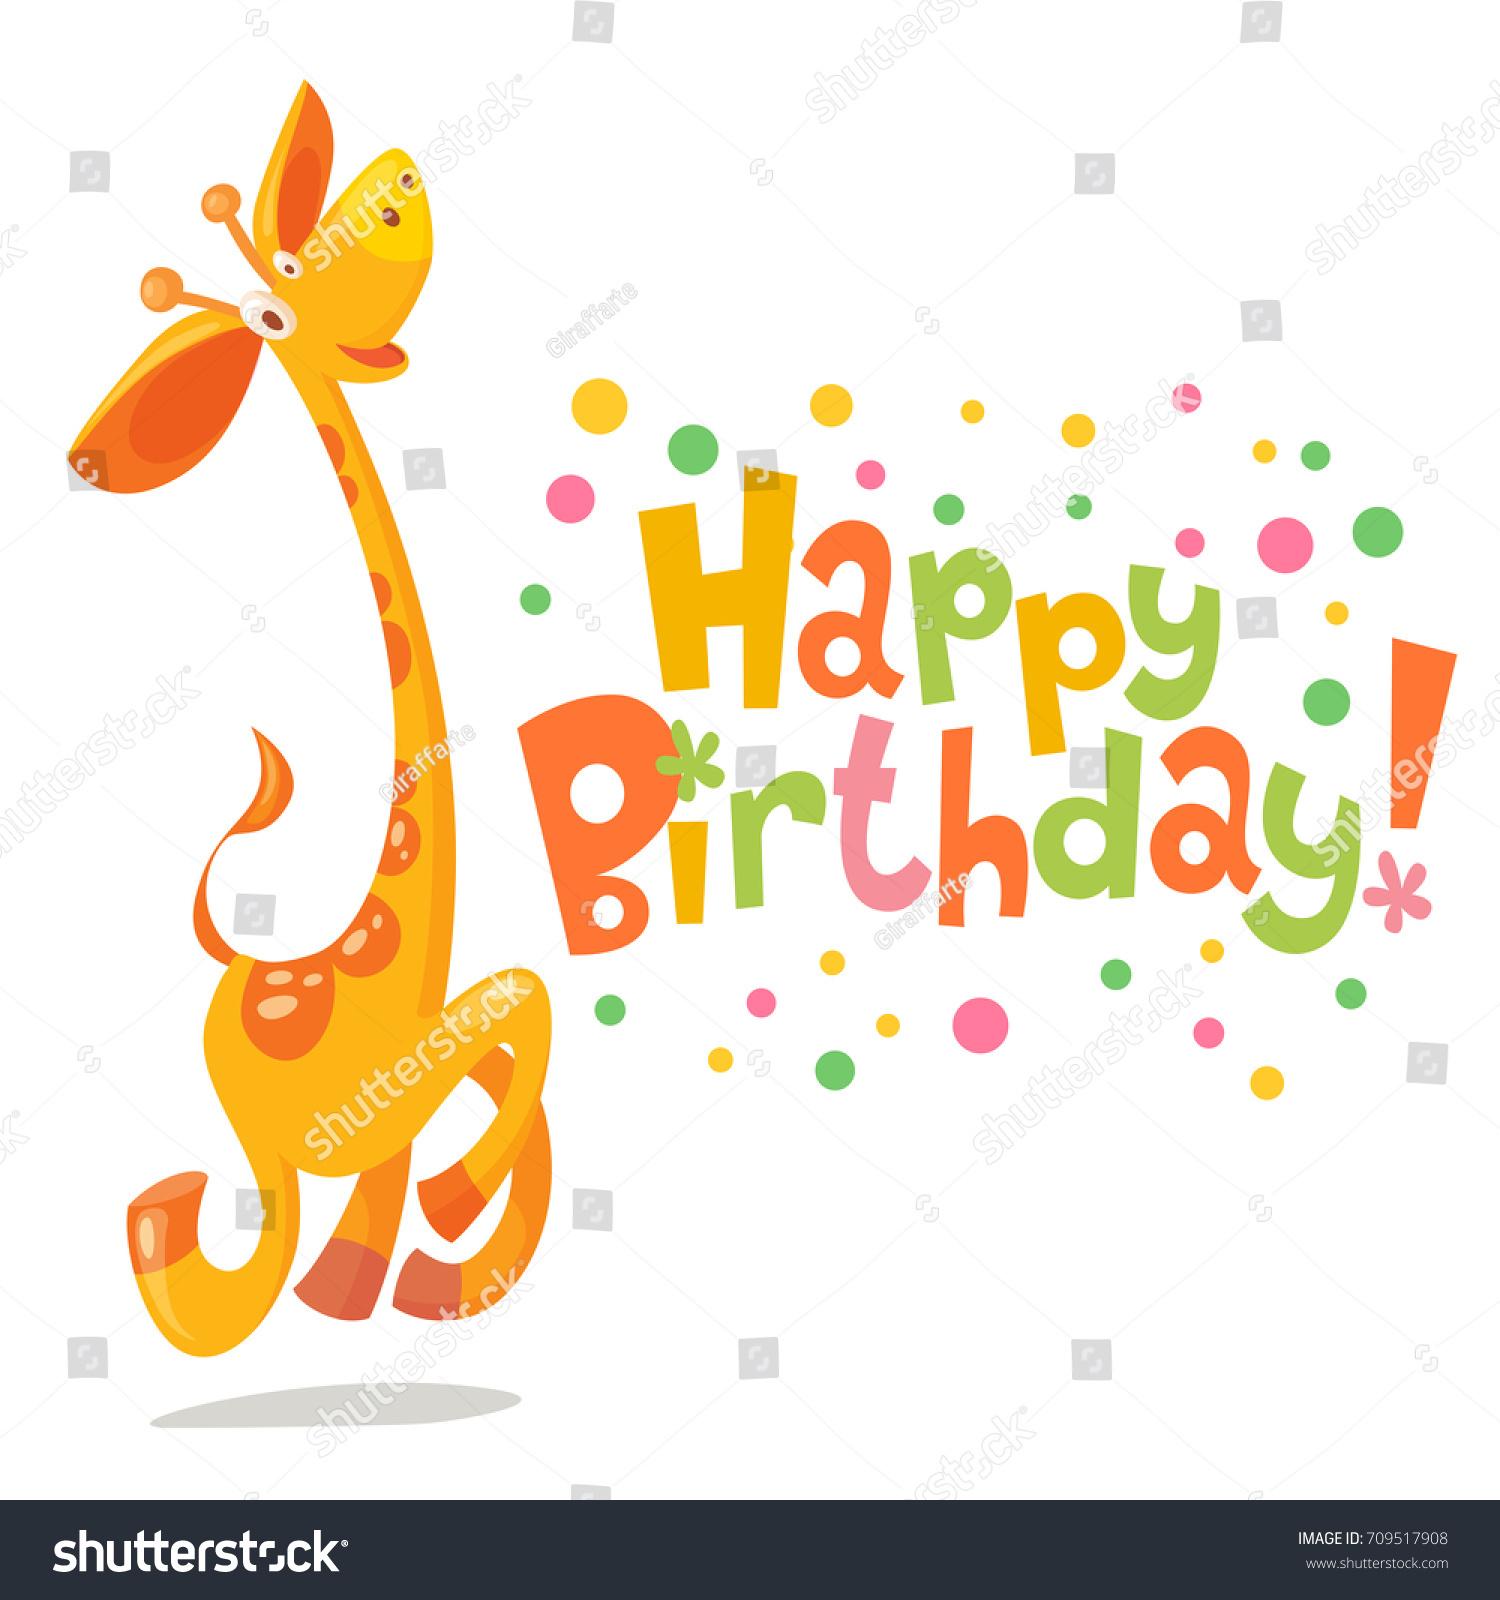 Happy birthday vector card baby birthday stock vector 709517908 happy birthday vector card baby birthday card with cute giraffe bookmarktalkfo Choice Image